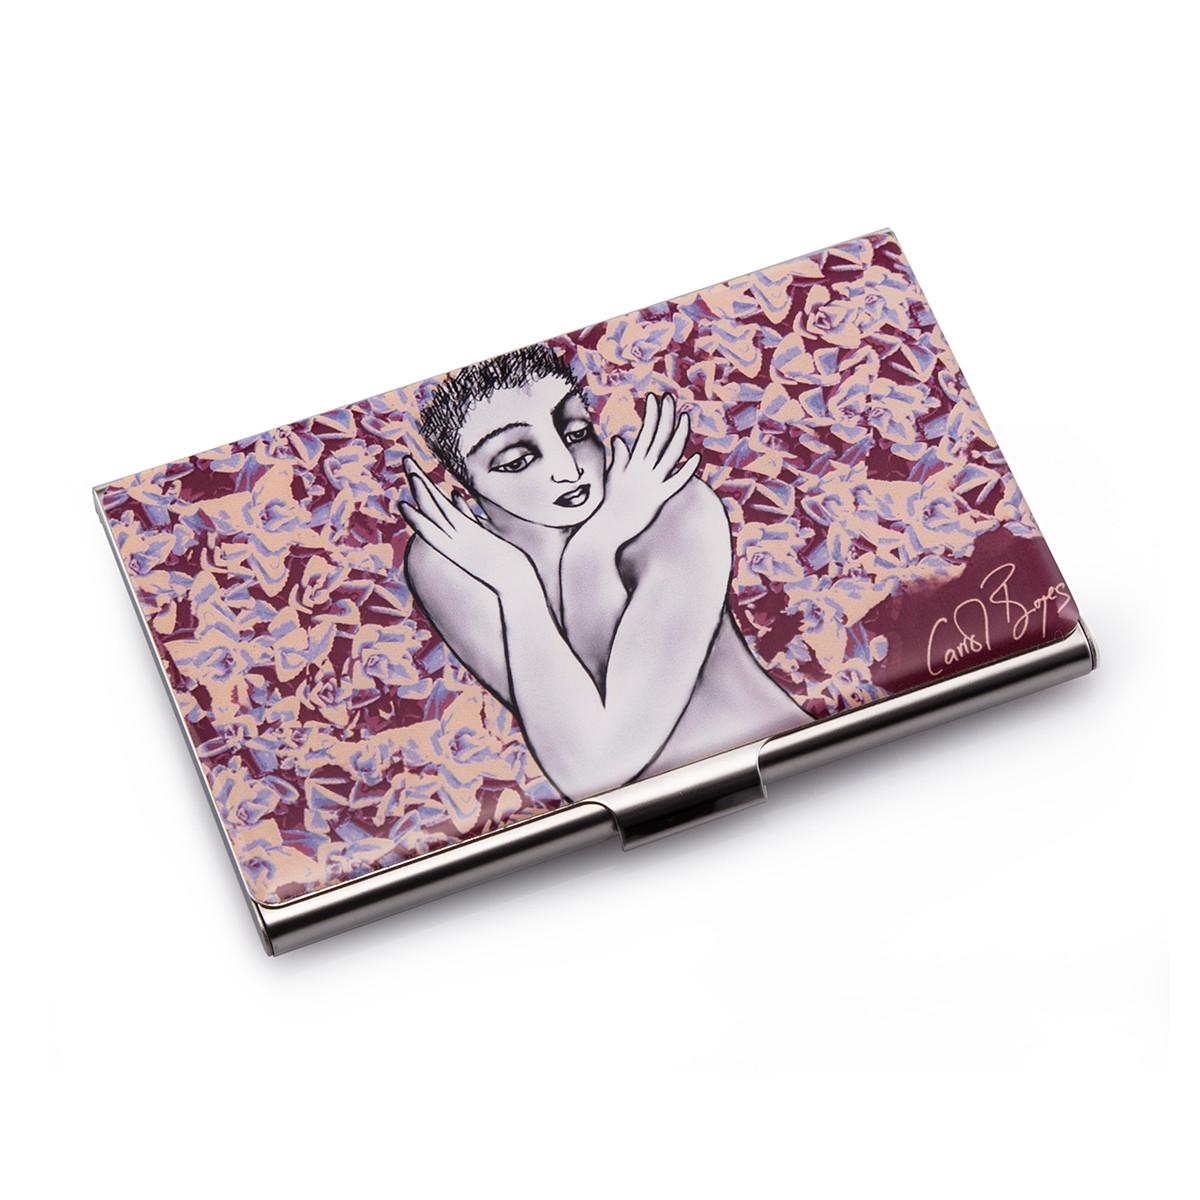 BUSINESS CARD CASE - flutter